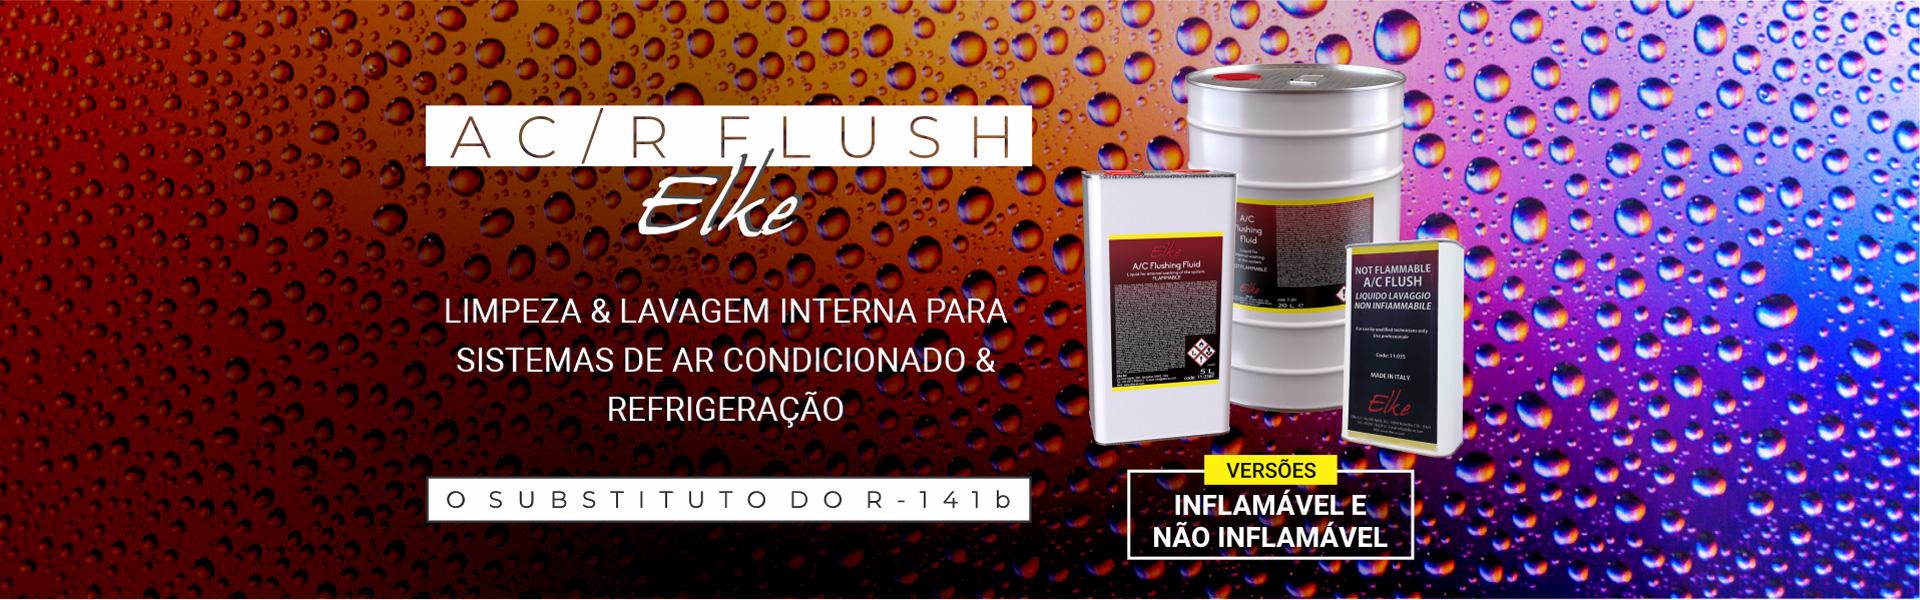 AC/R FLUSH ELKE